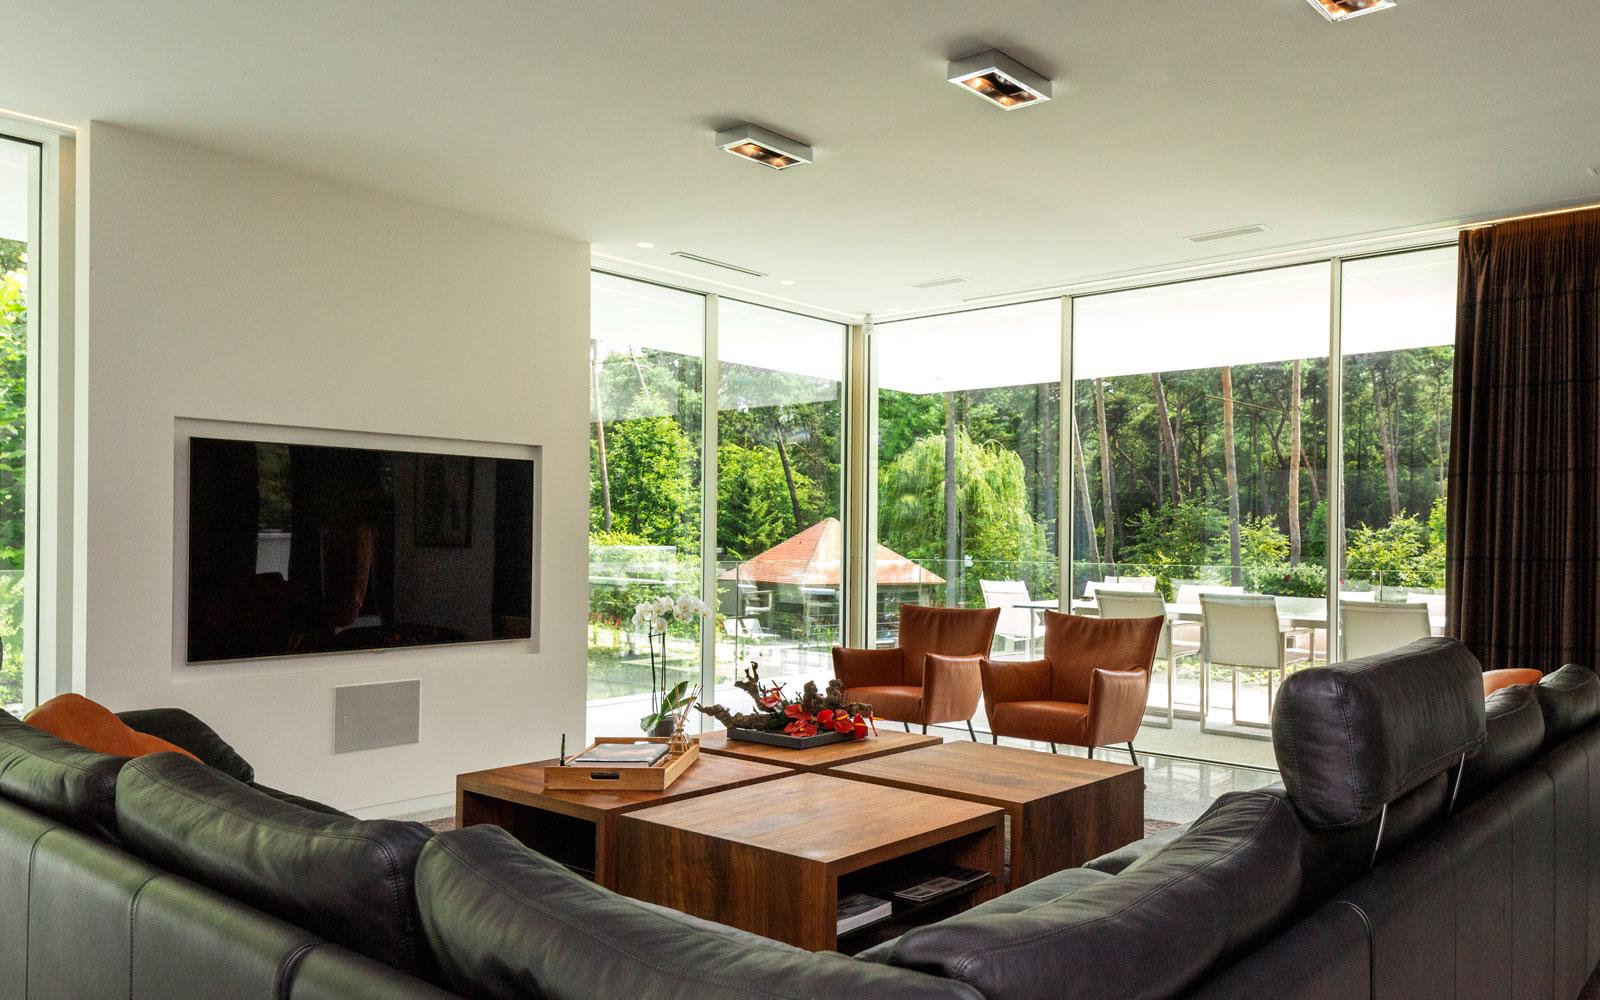 Woonkamer, hoekbank, televisie, living, zithoek, grote ramen, MHB, minimalistische villa, VLCS Architecten